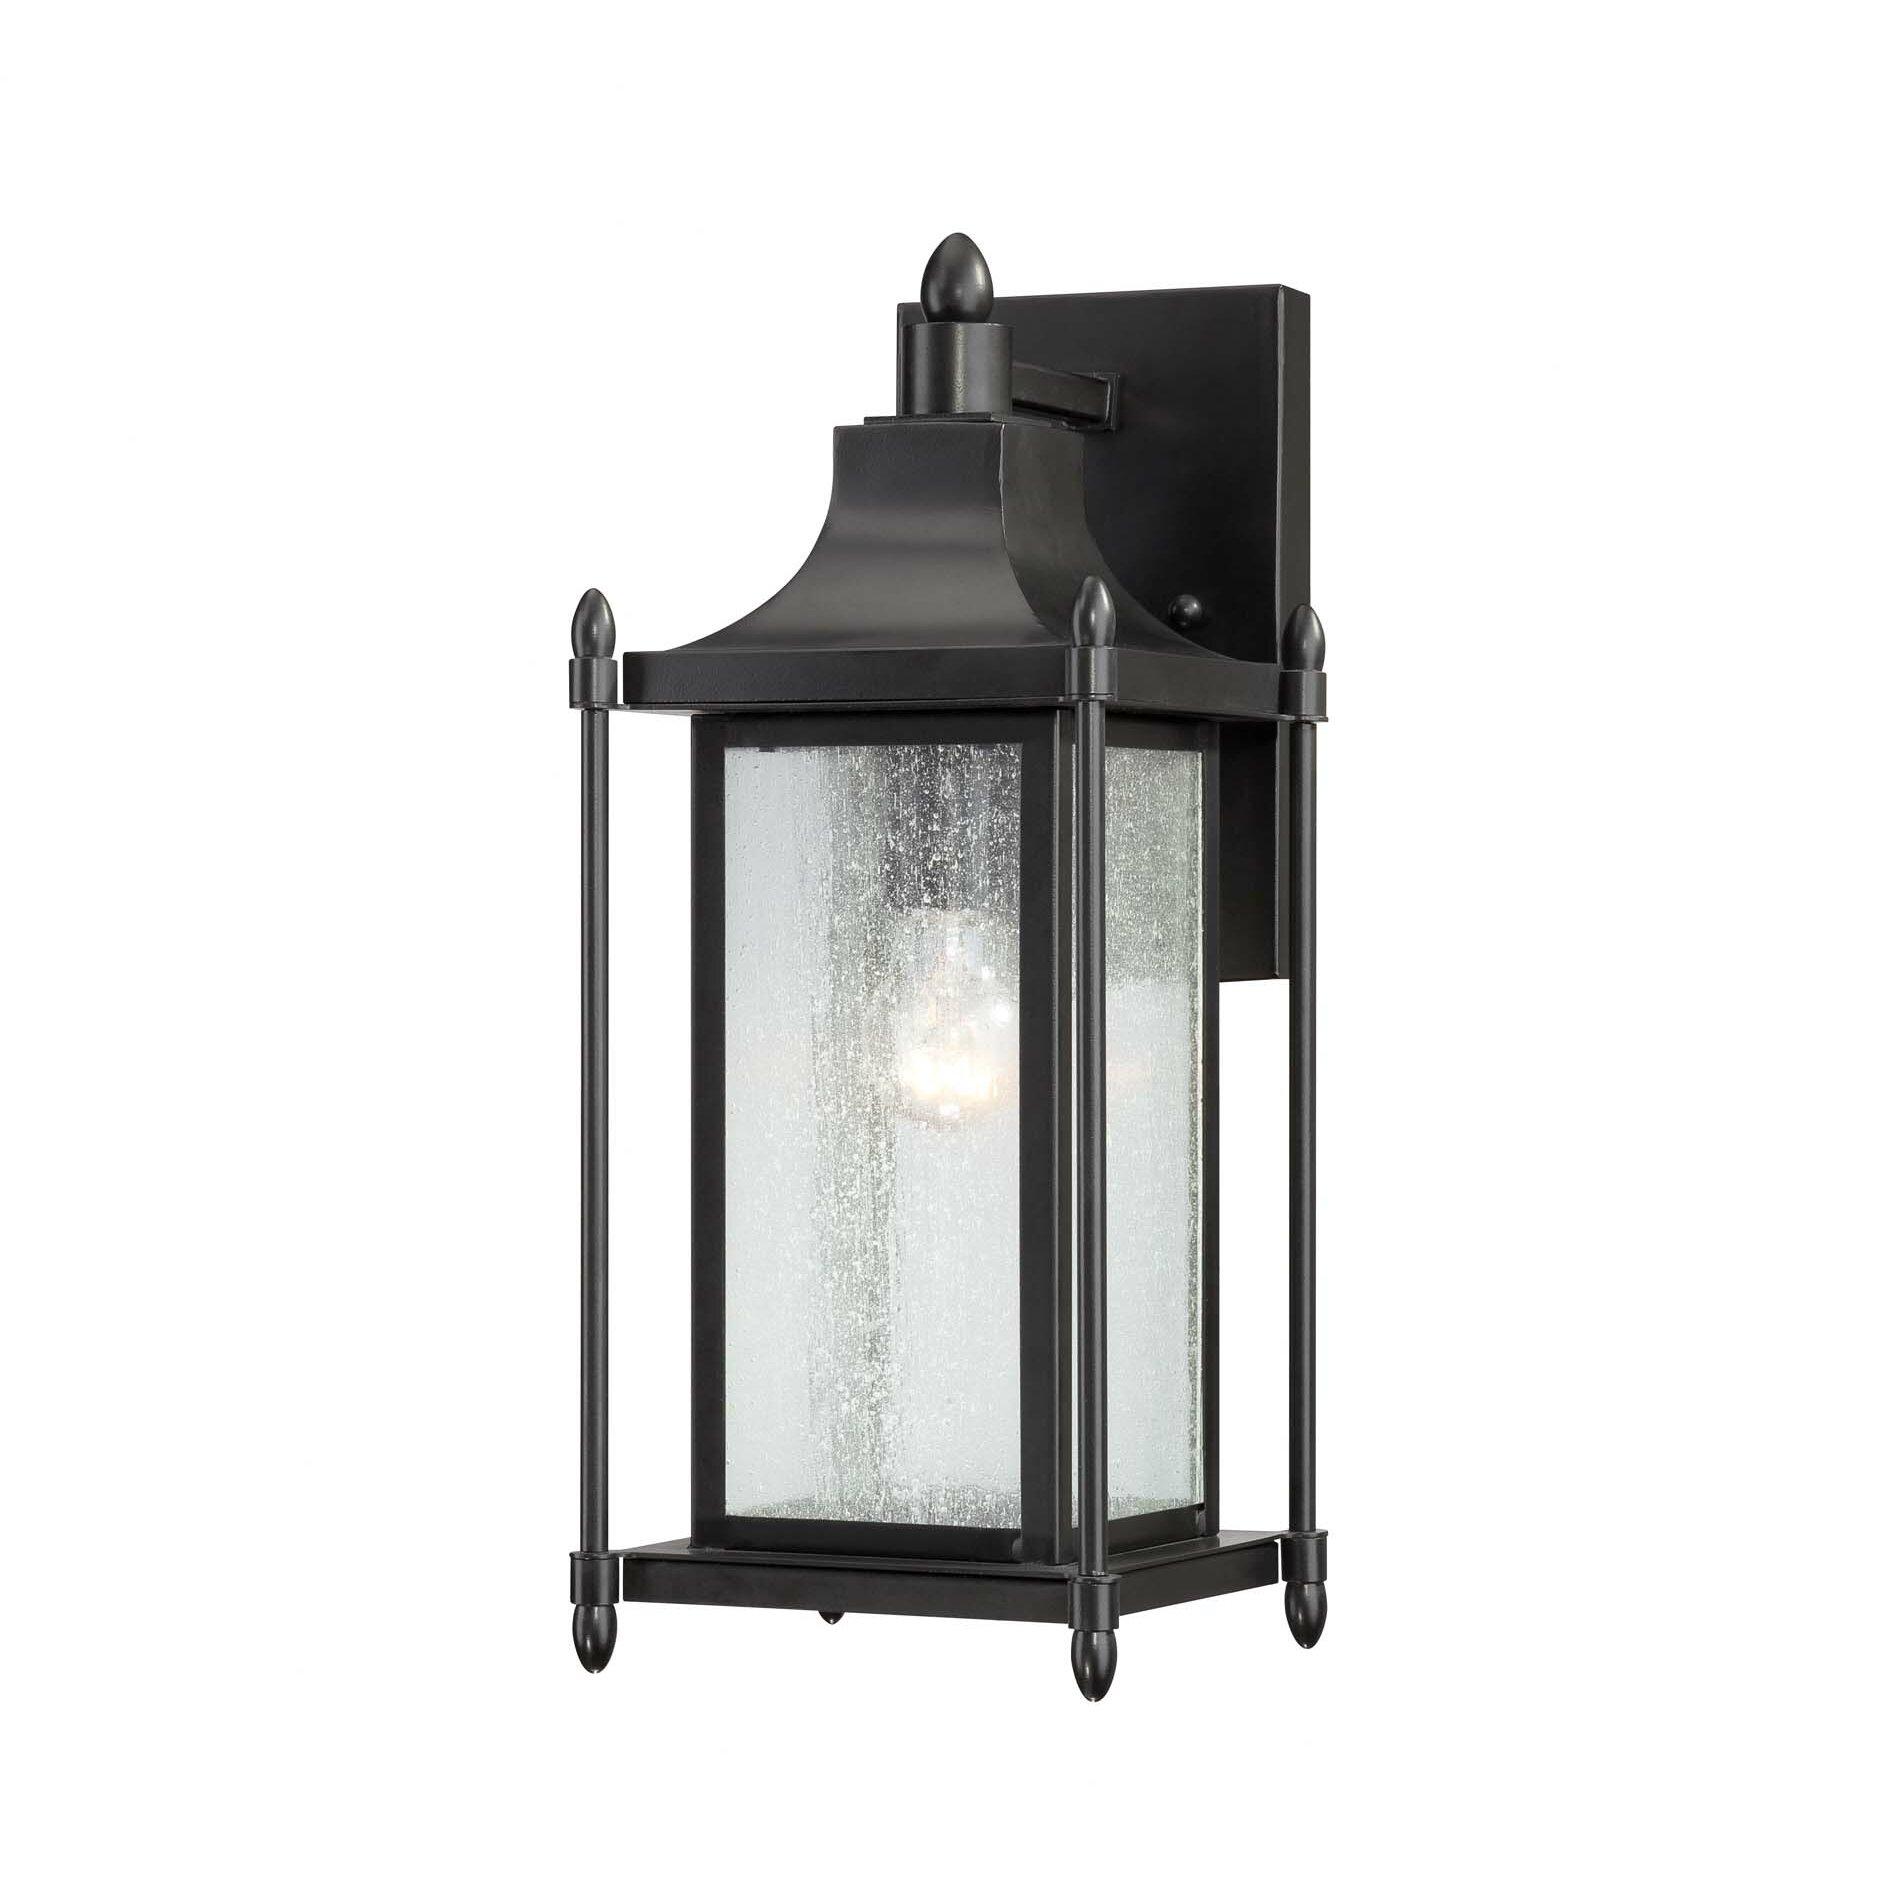 Savoy House Dunnmore 1 Light Outdoor Wall Lantern & Reviews Wayfair